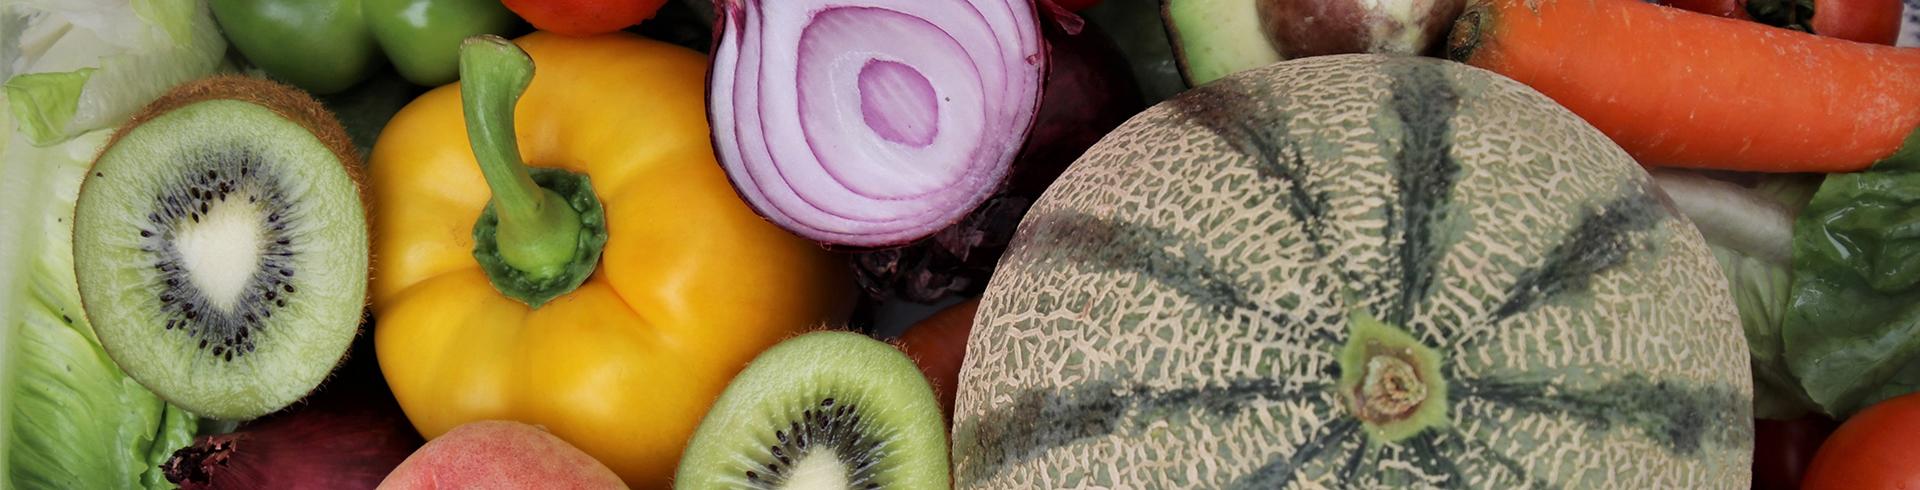 fruits and vegetables together